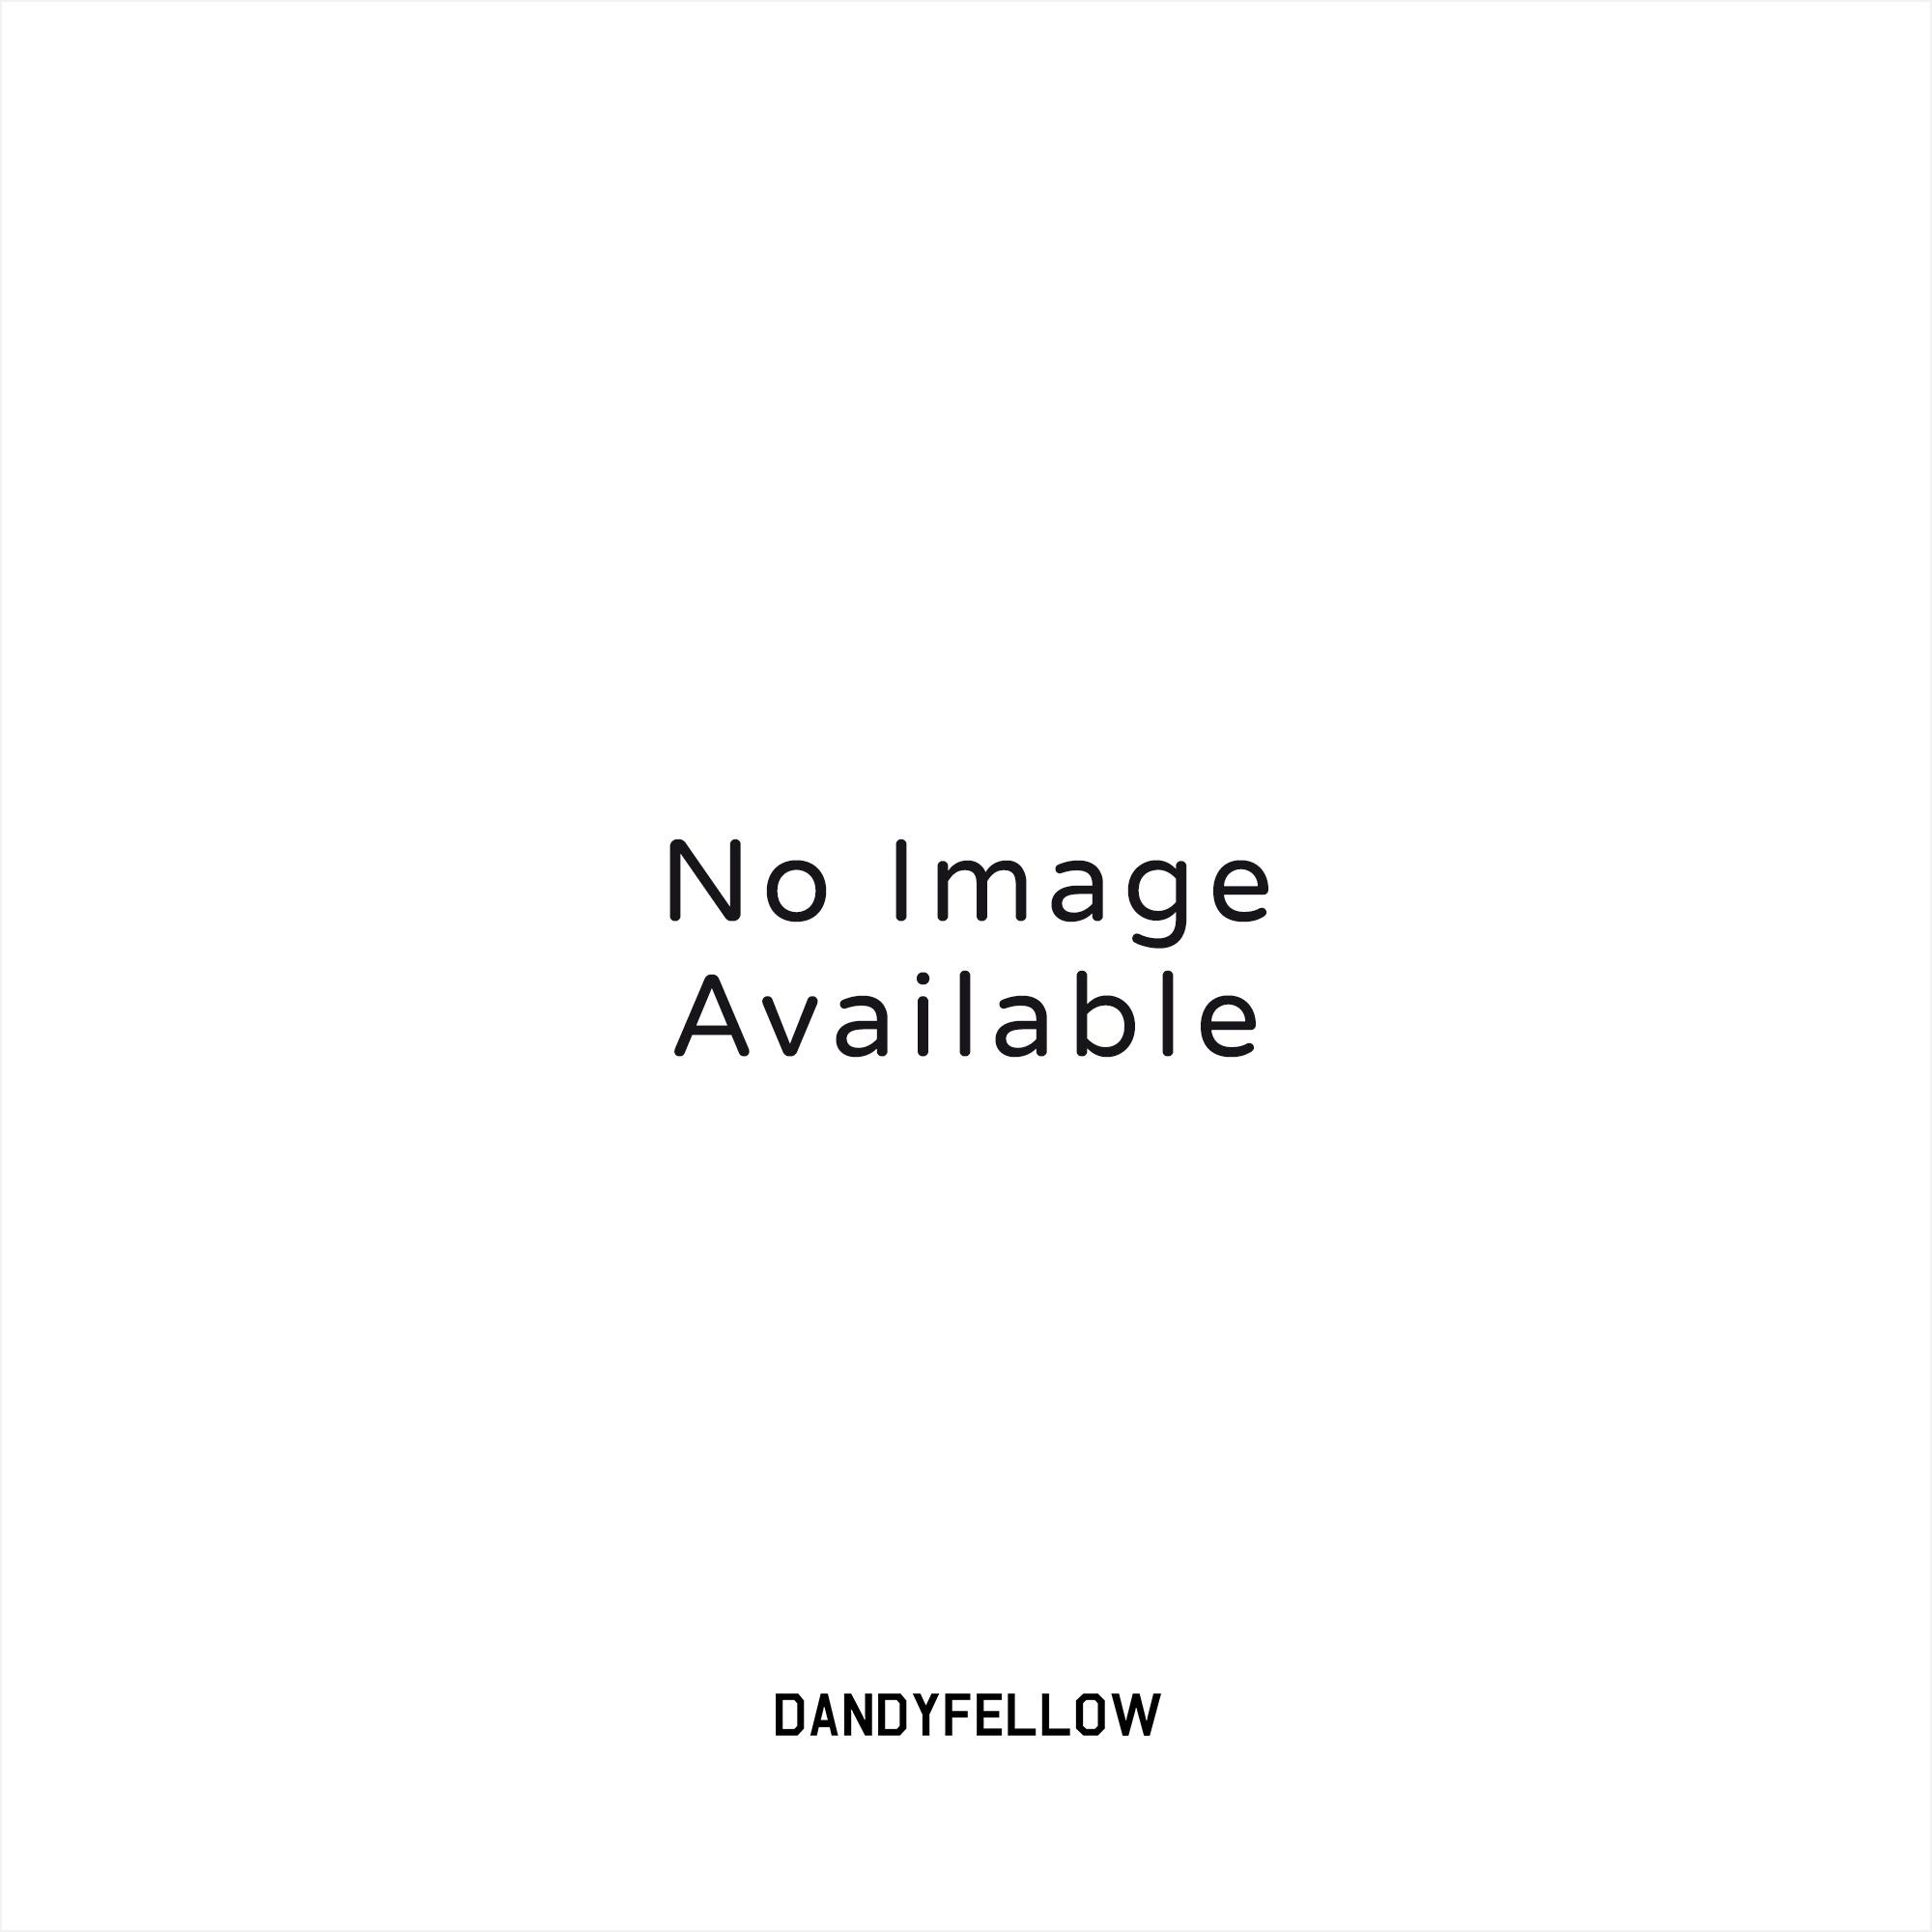 b3e2c0705fa3 Nike Womens Classic Cortez PRM Sneakers (White) at Dandy Fellow